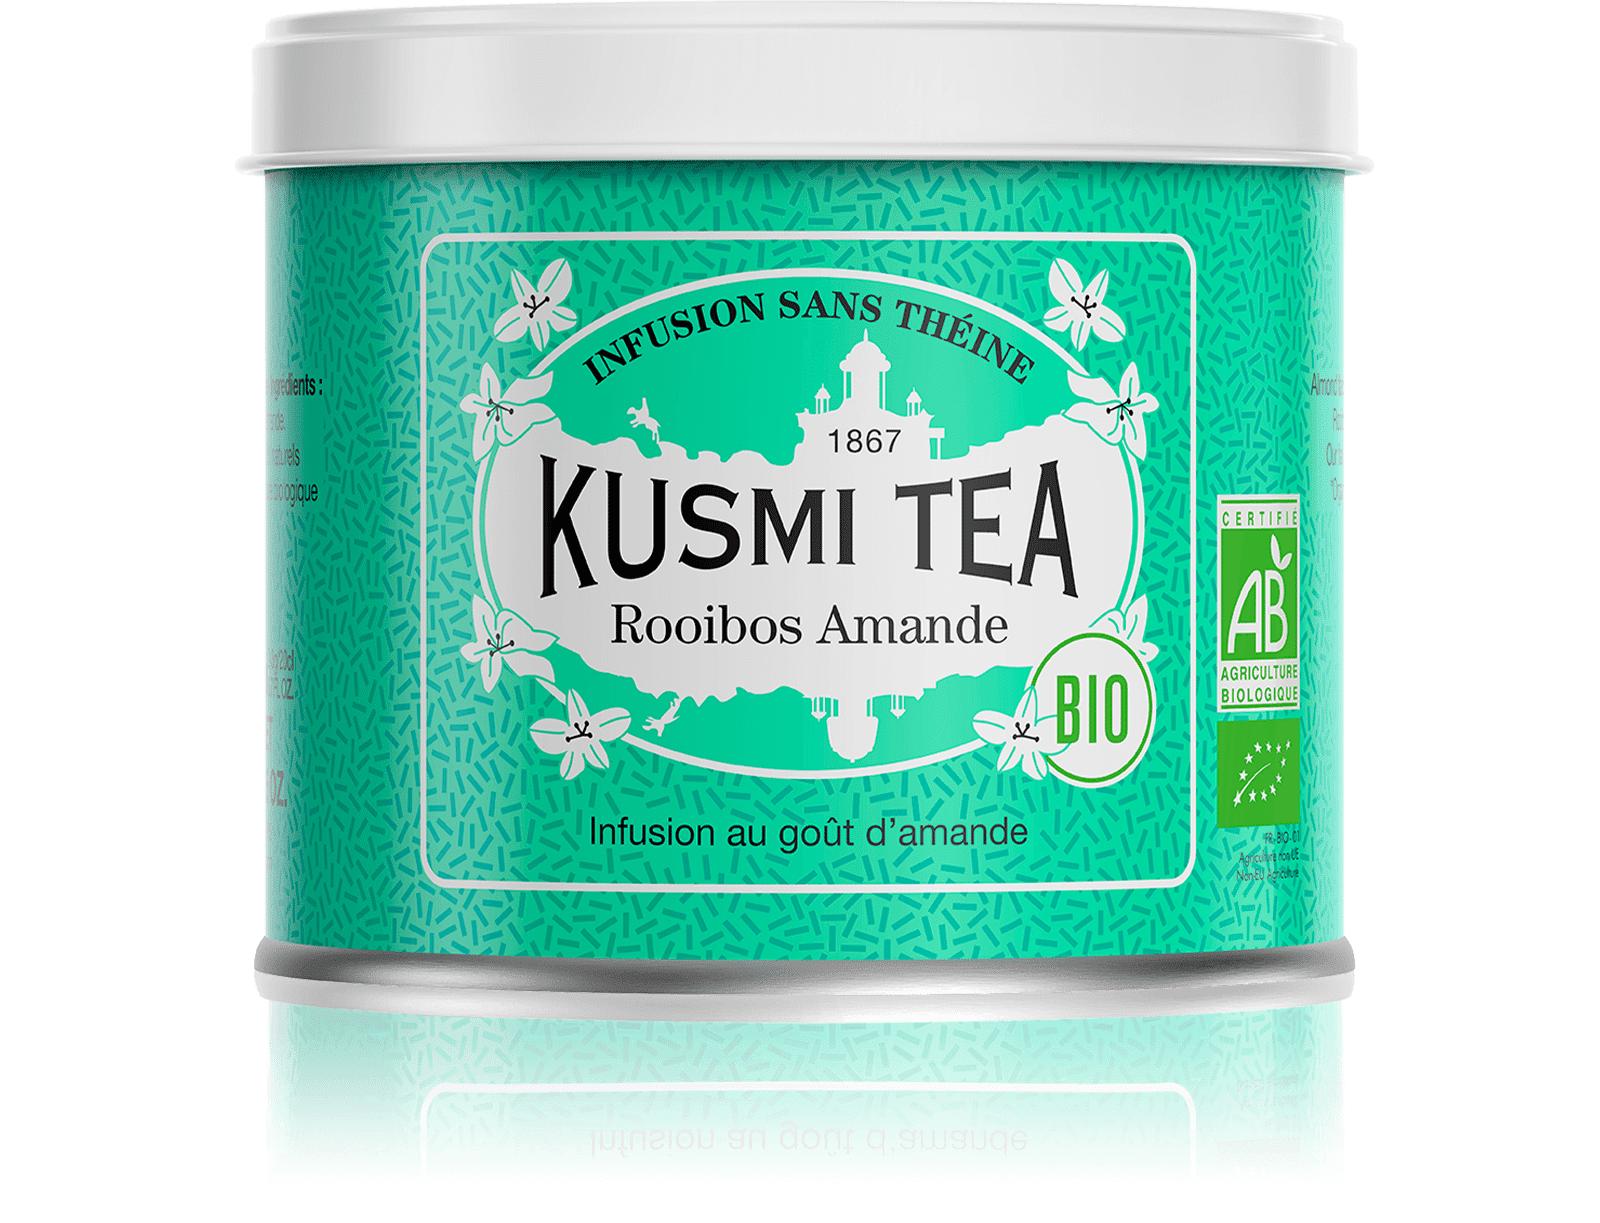 KUSMI TEA Rooibos Amande (Infusion bio) - Infusion au goût d'amande - Boite à thé en vrac - Kusmi Tea